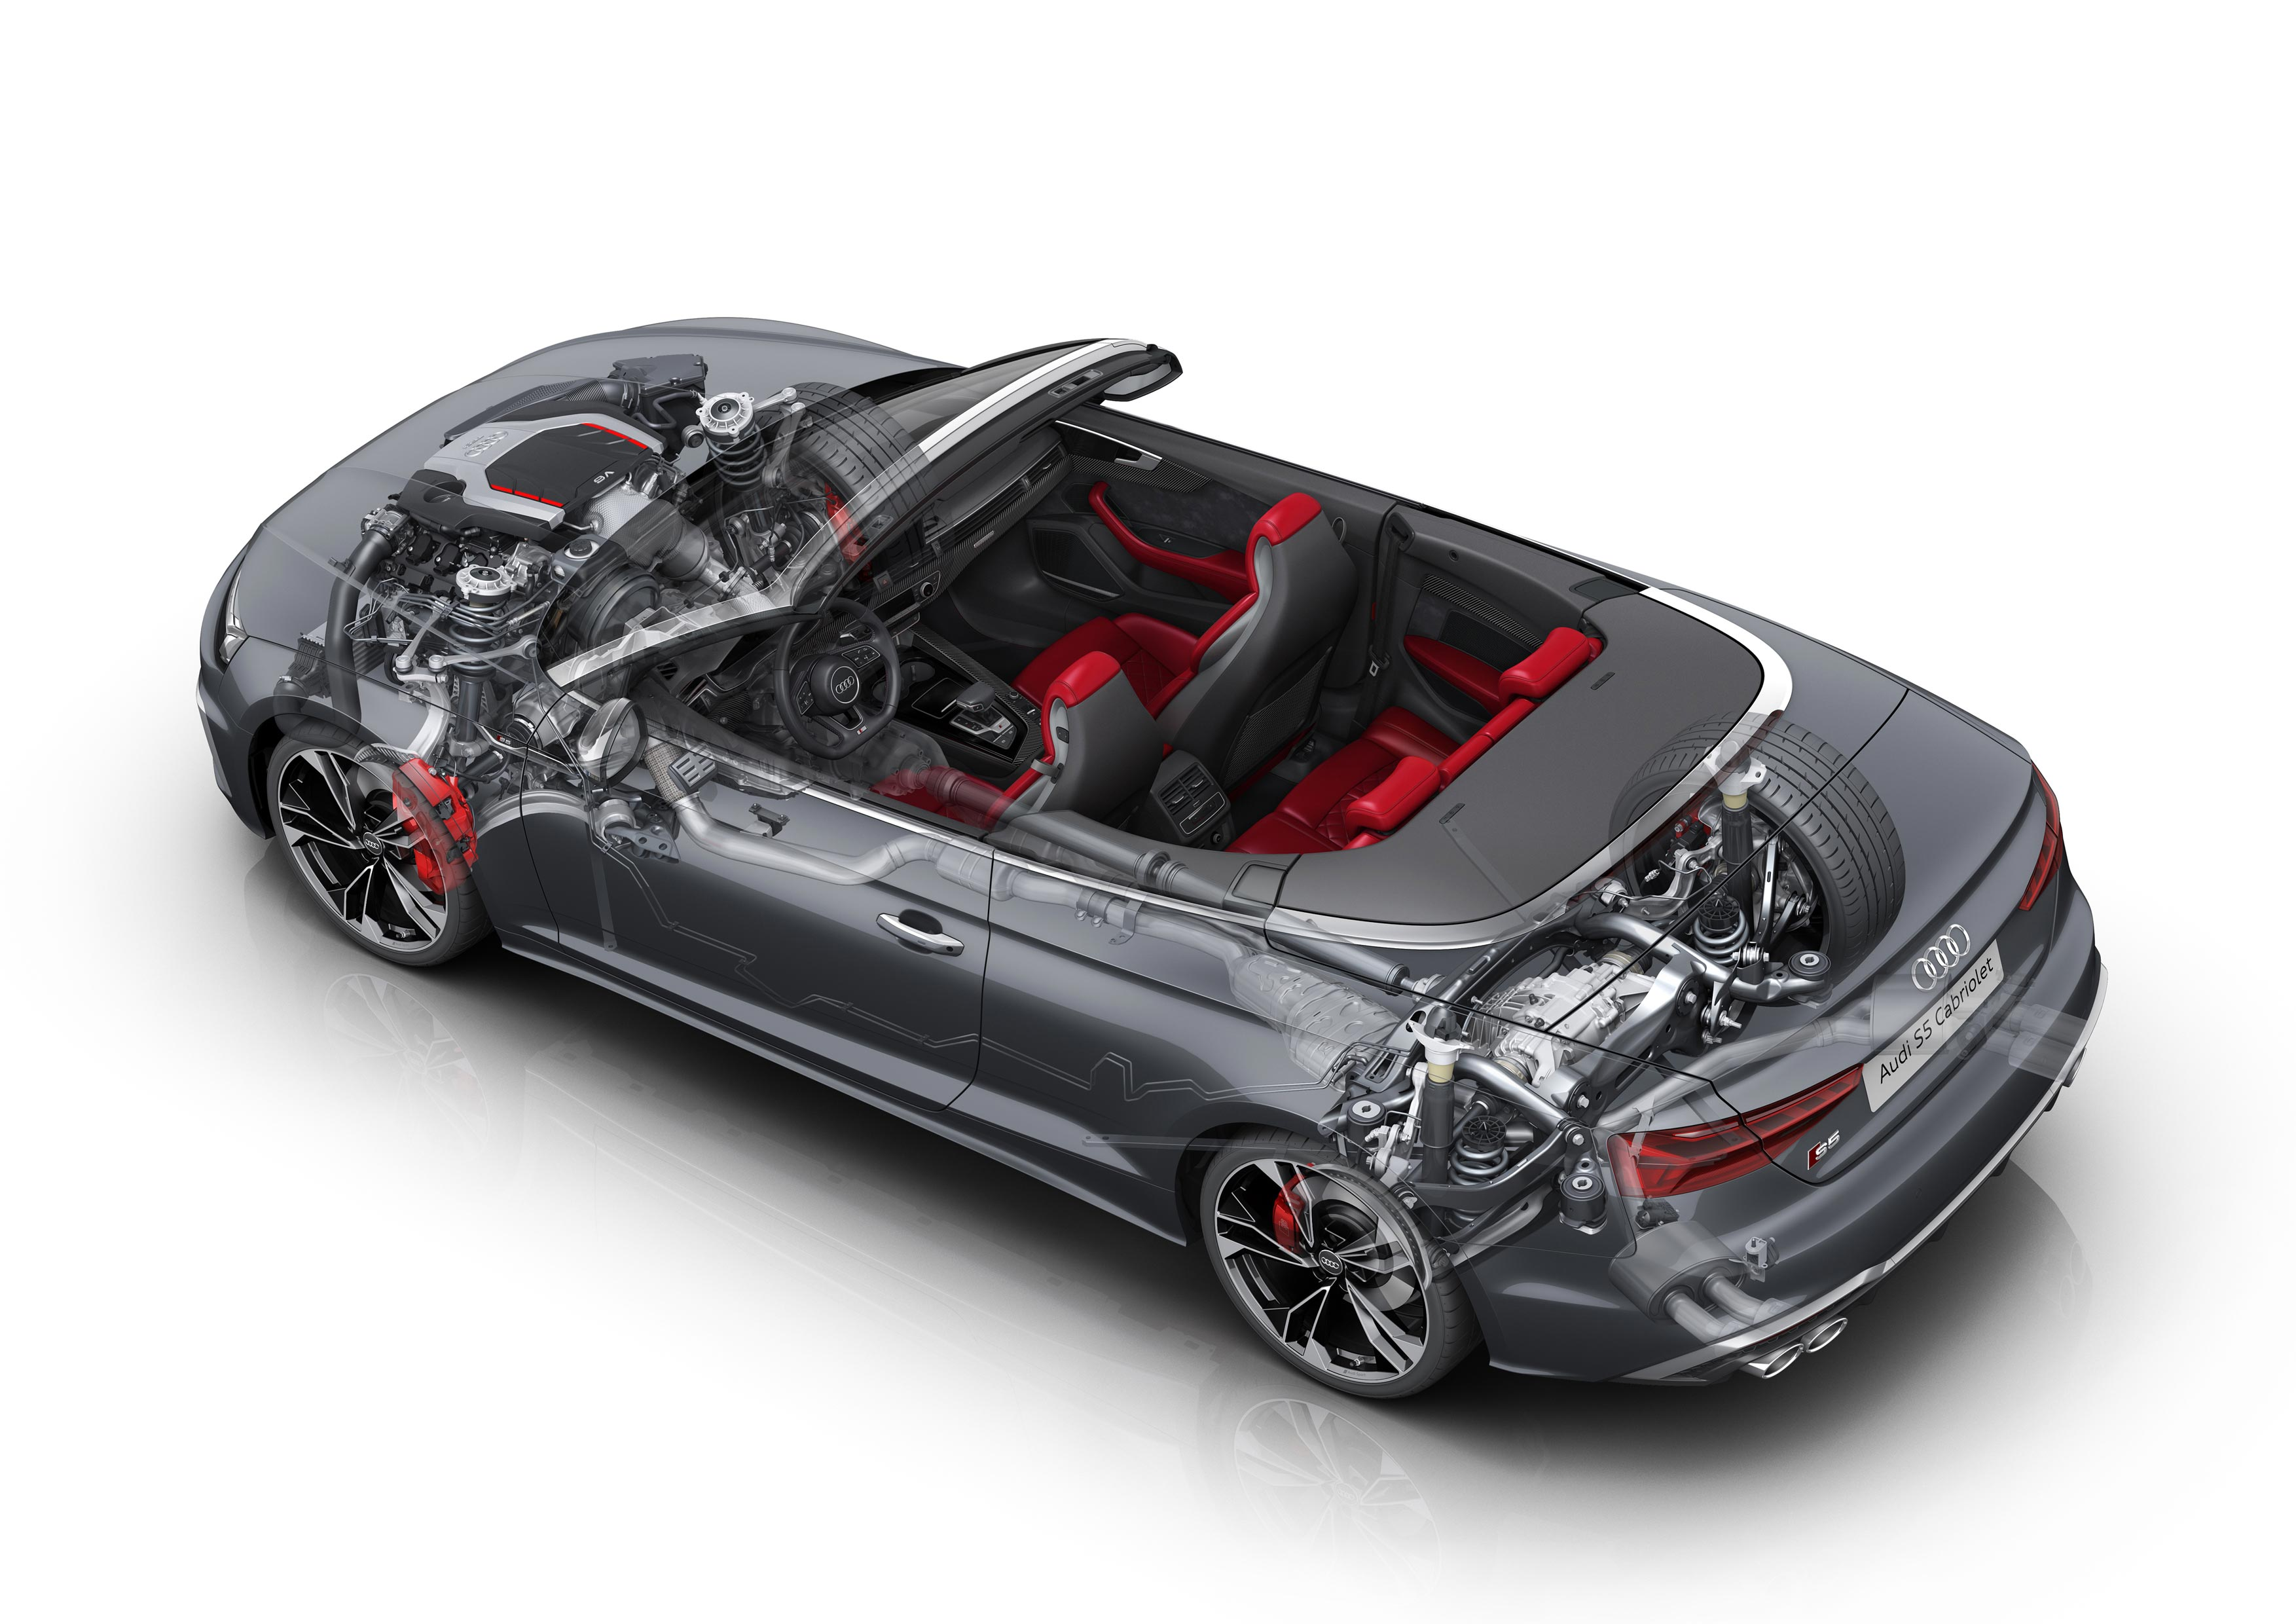 Audi S5 Cabriolet cutaway drawing